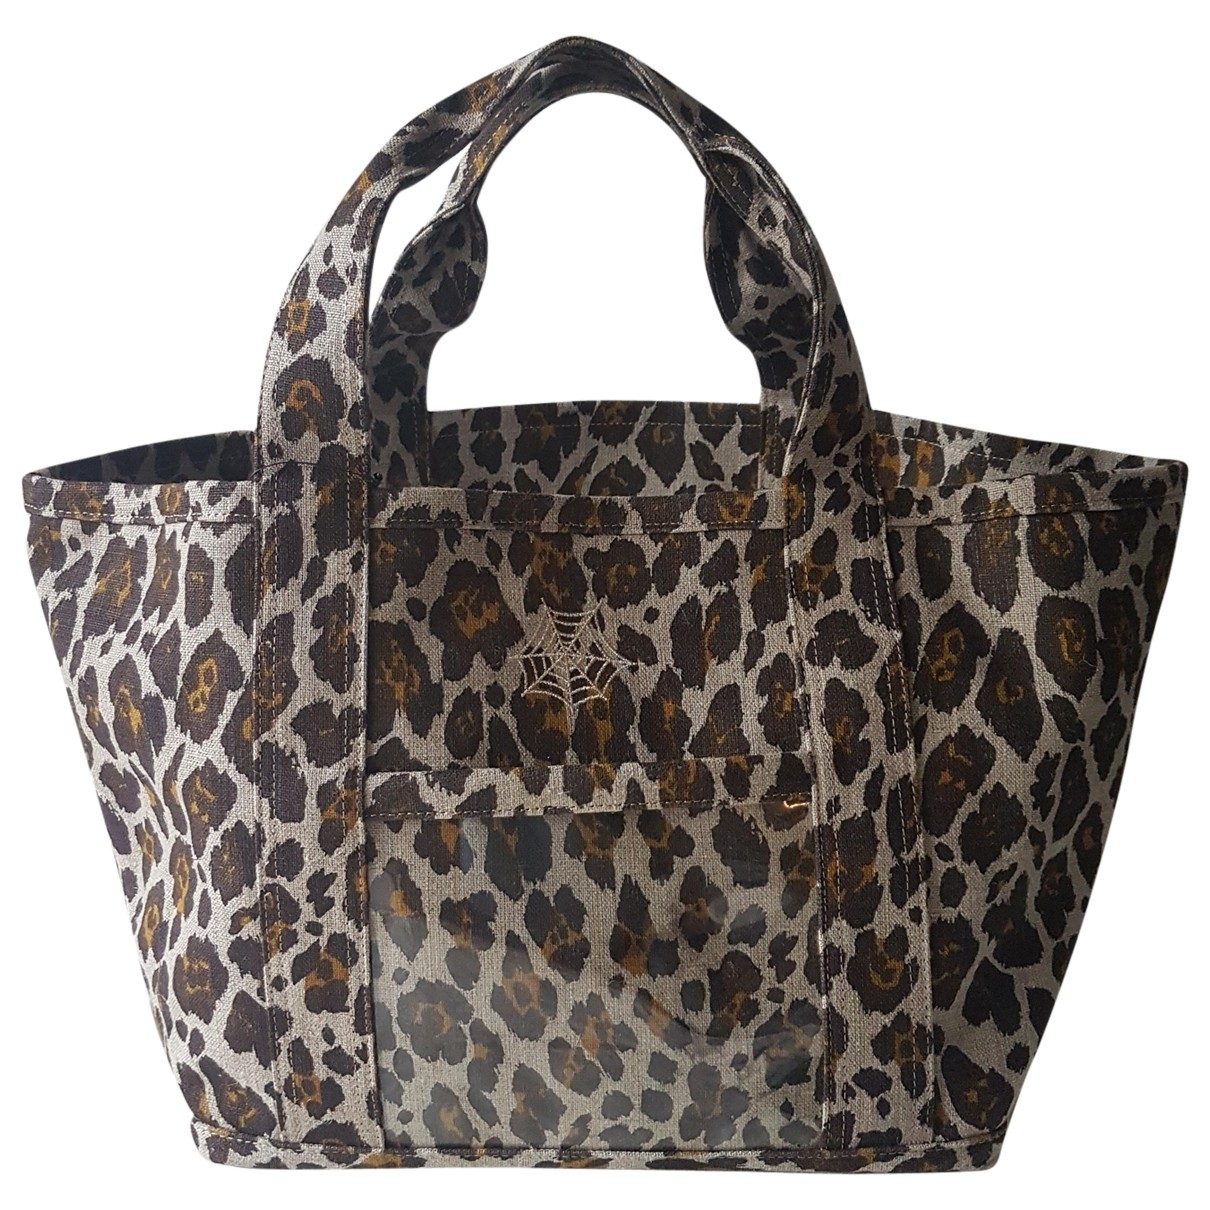 Charlotte Olympia \N Brown Cloth handbag for Women \N